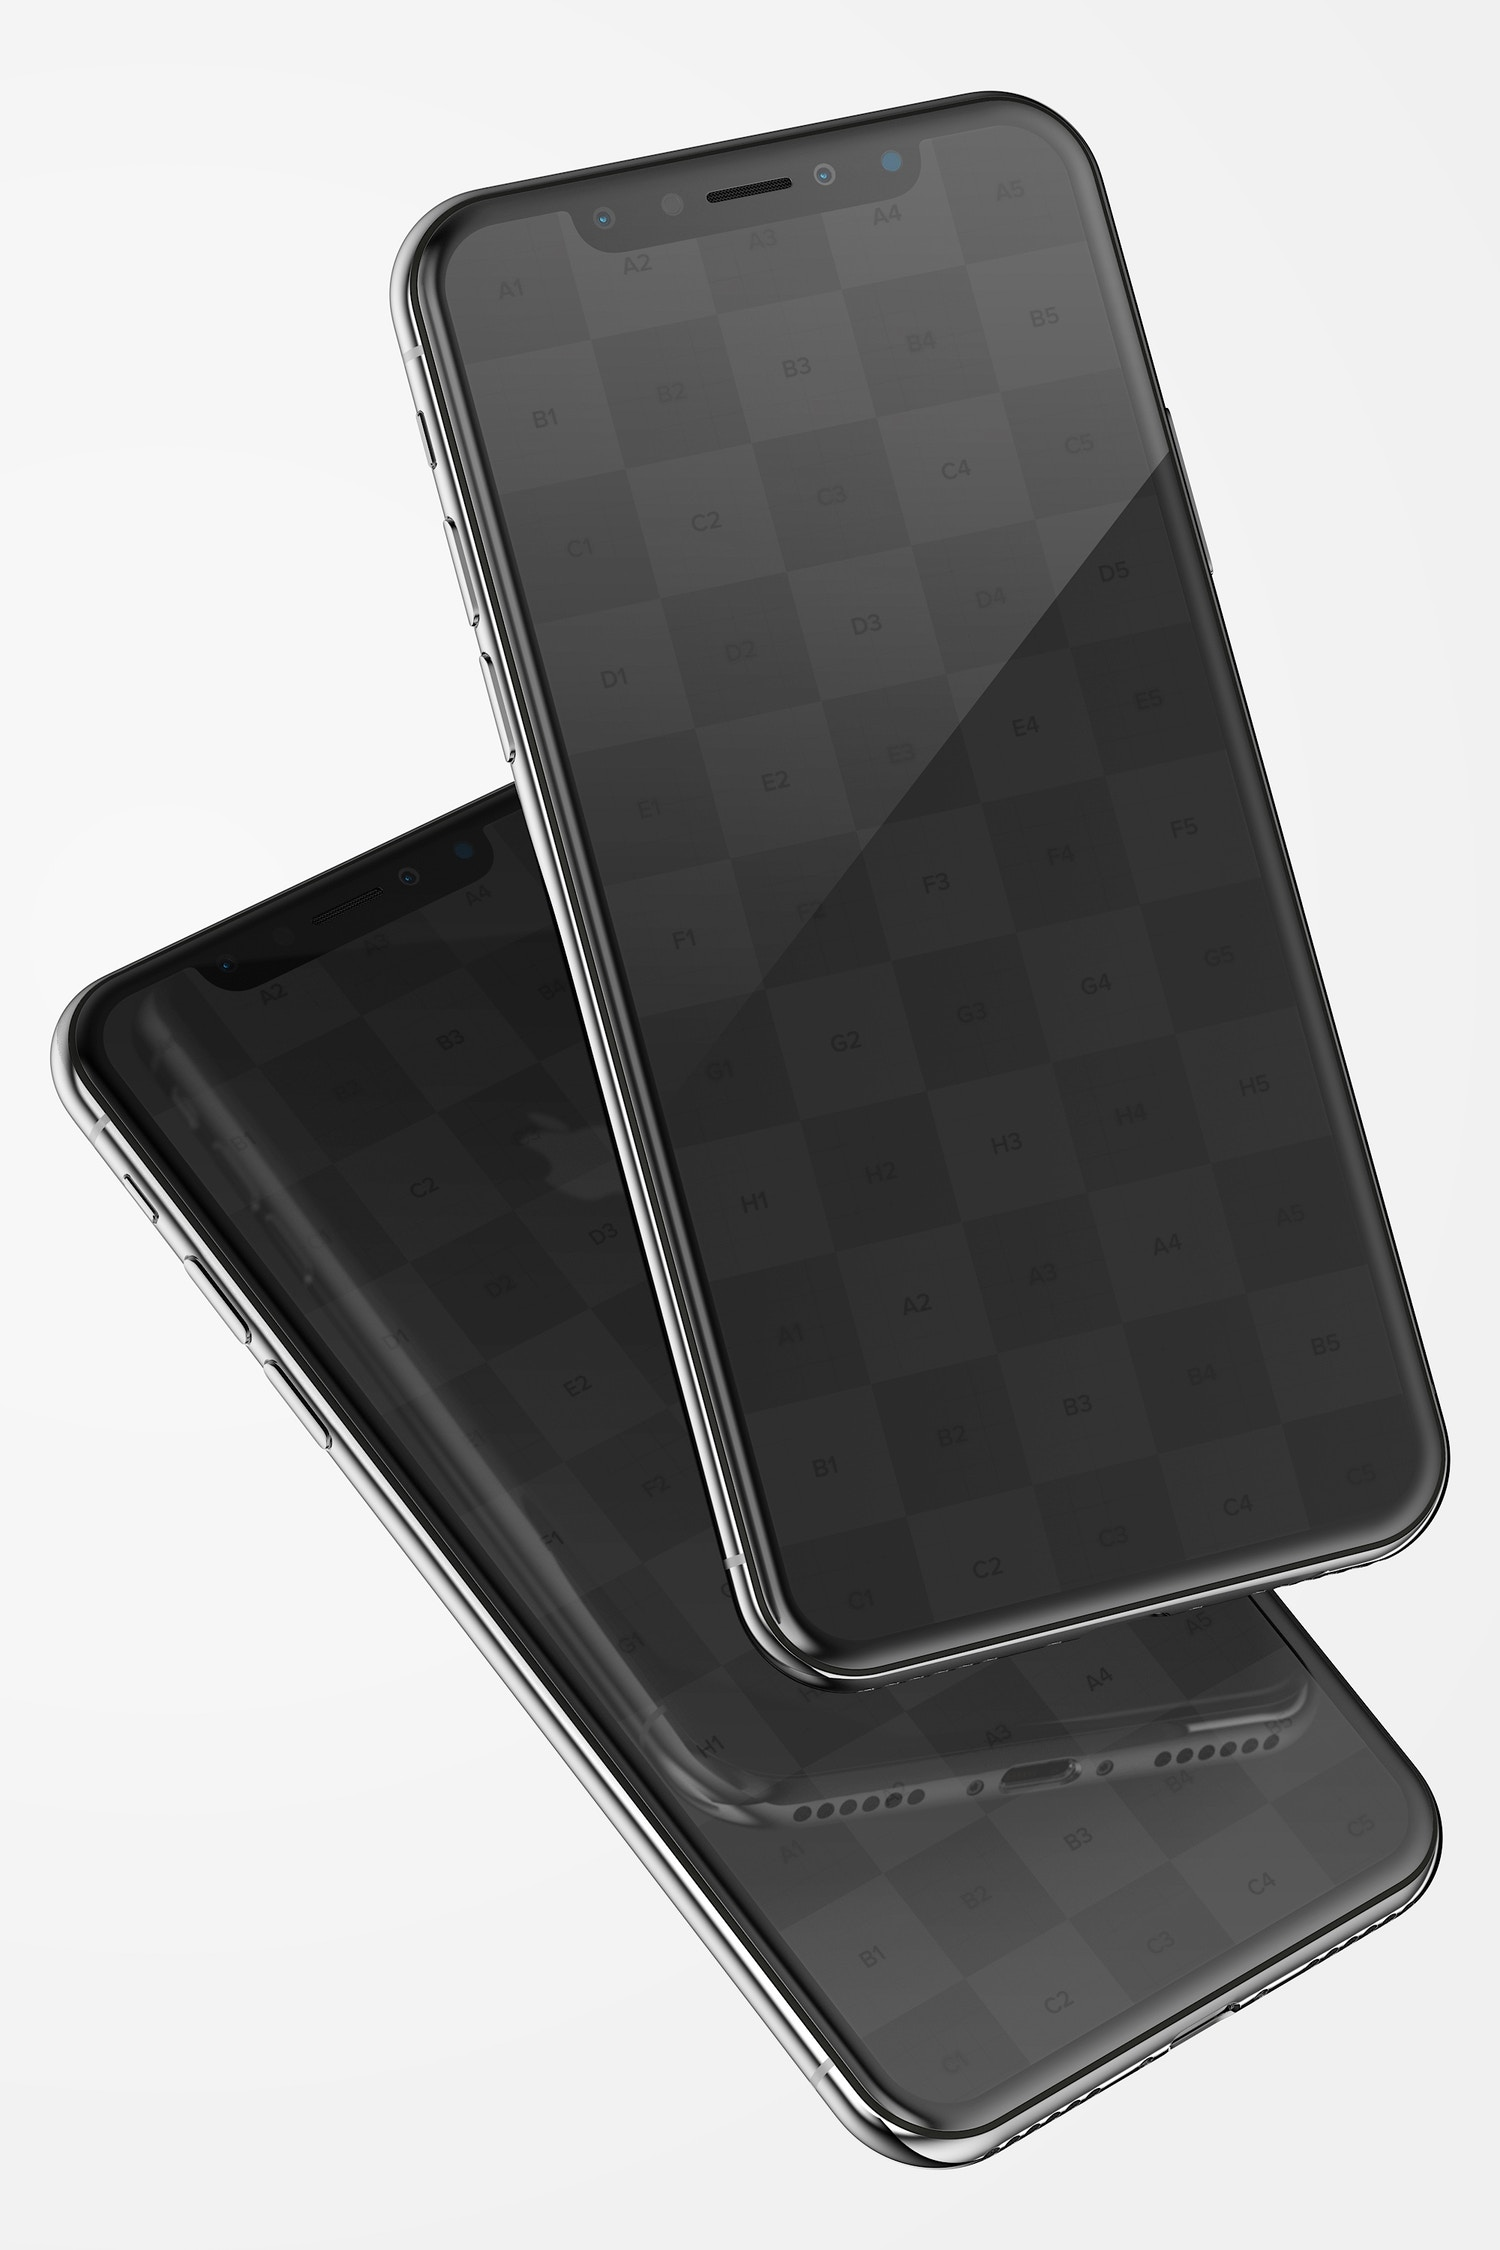 iPhone X Mockup 04